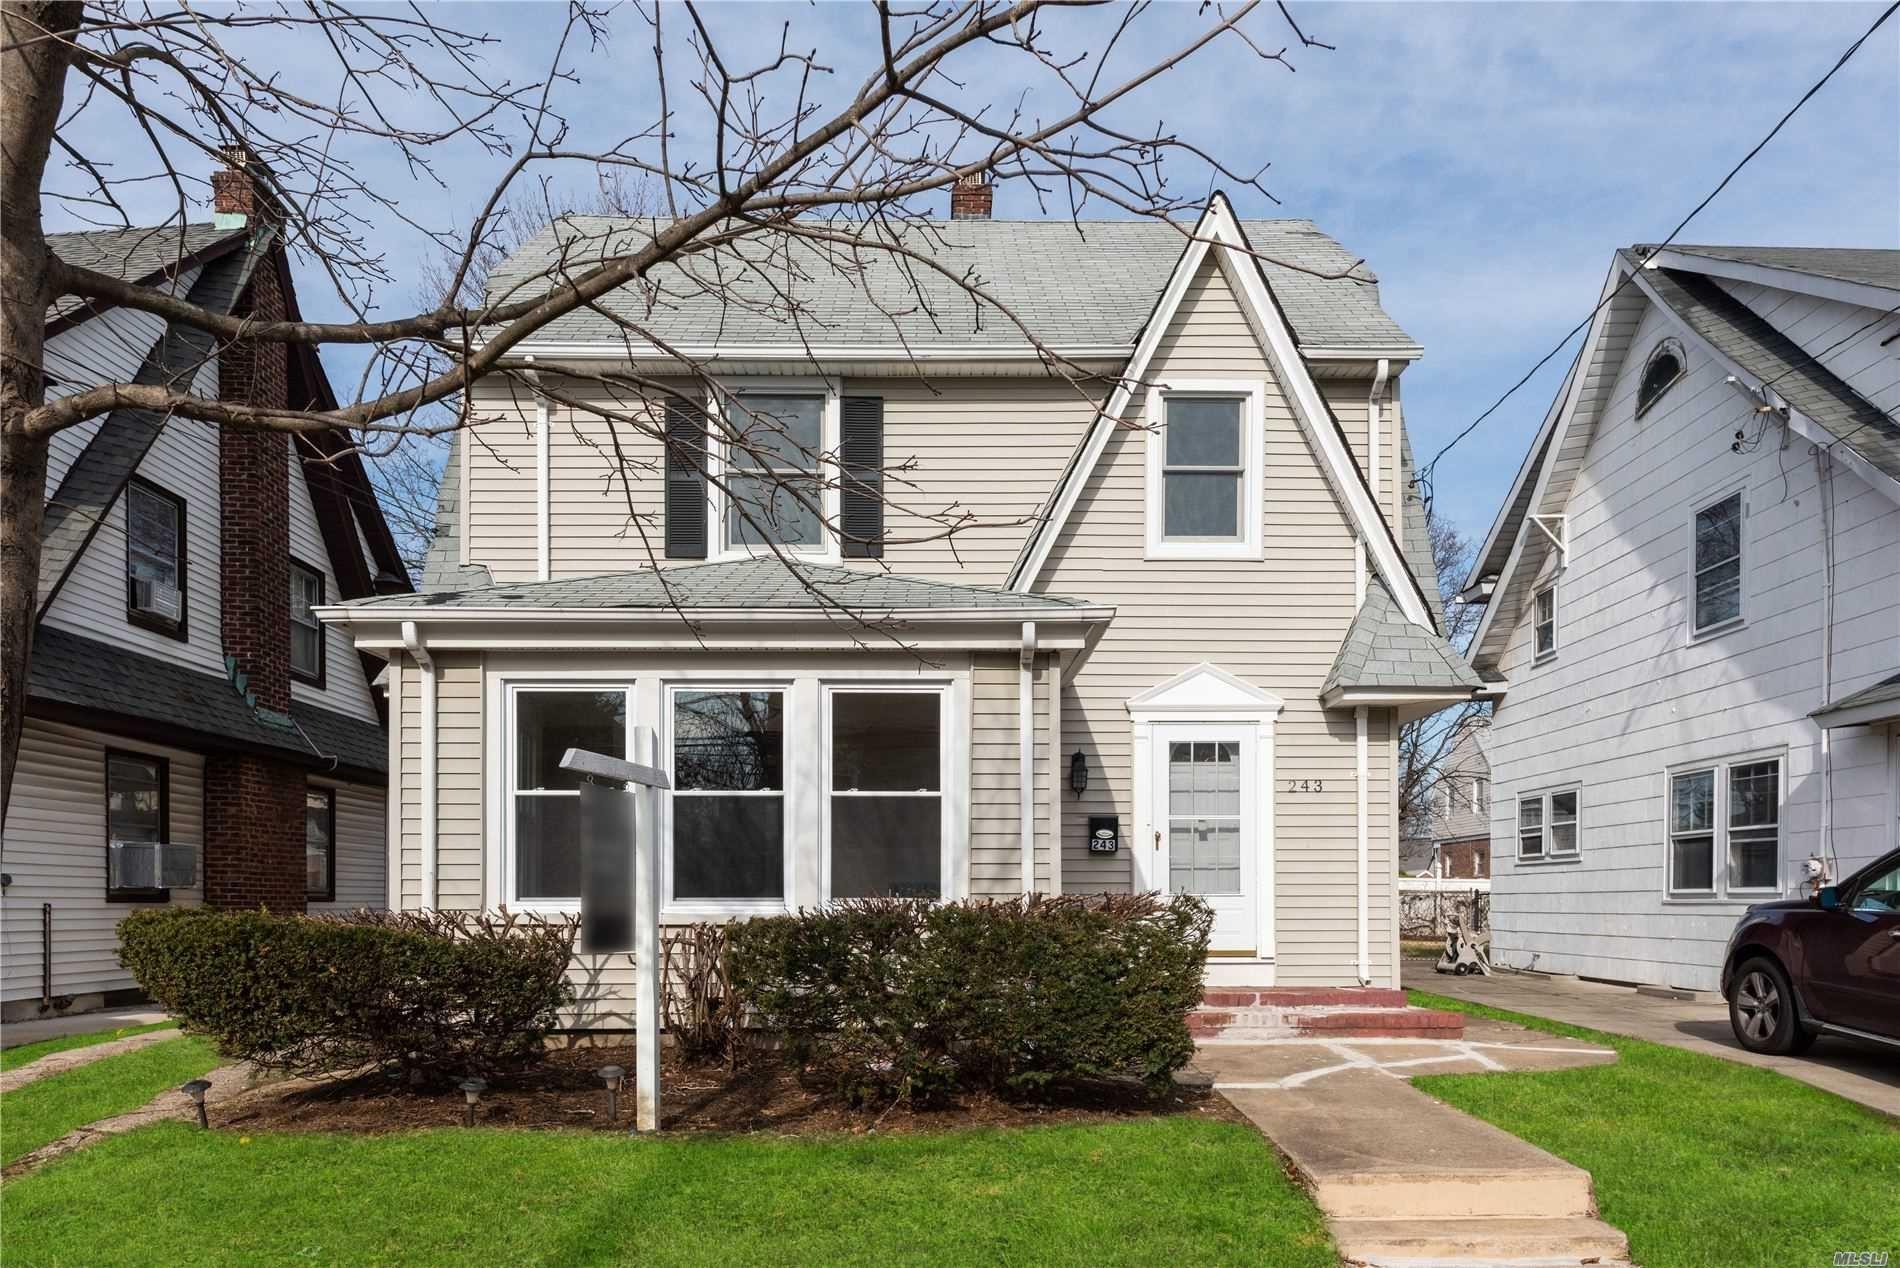 243 Brown Avenue, Hempstead, NY 11550 - MLS#: 3204225